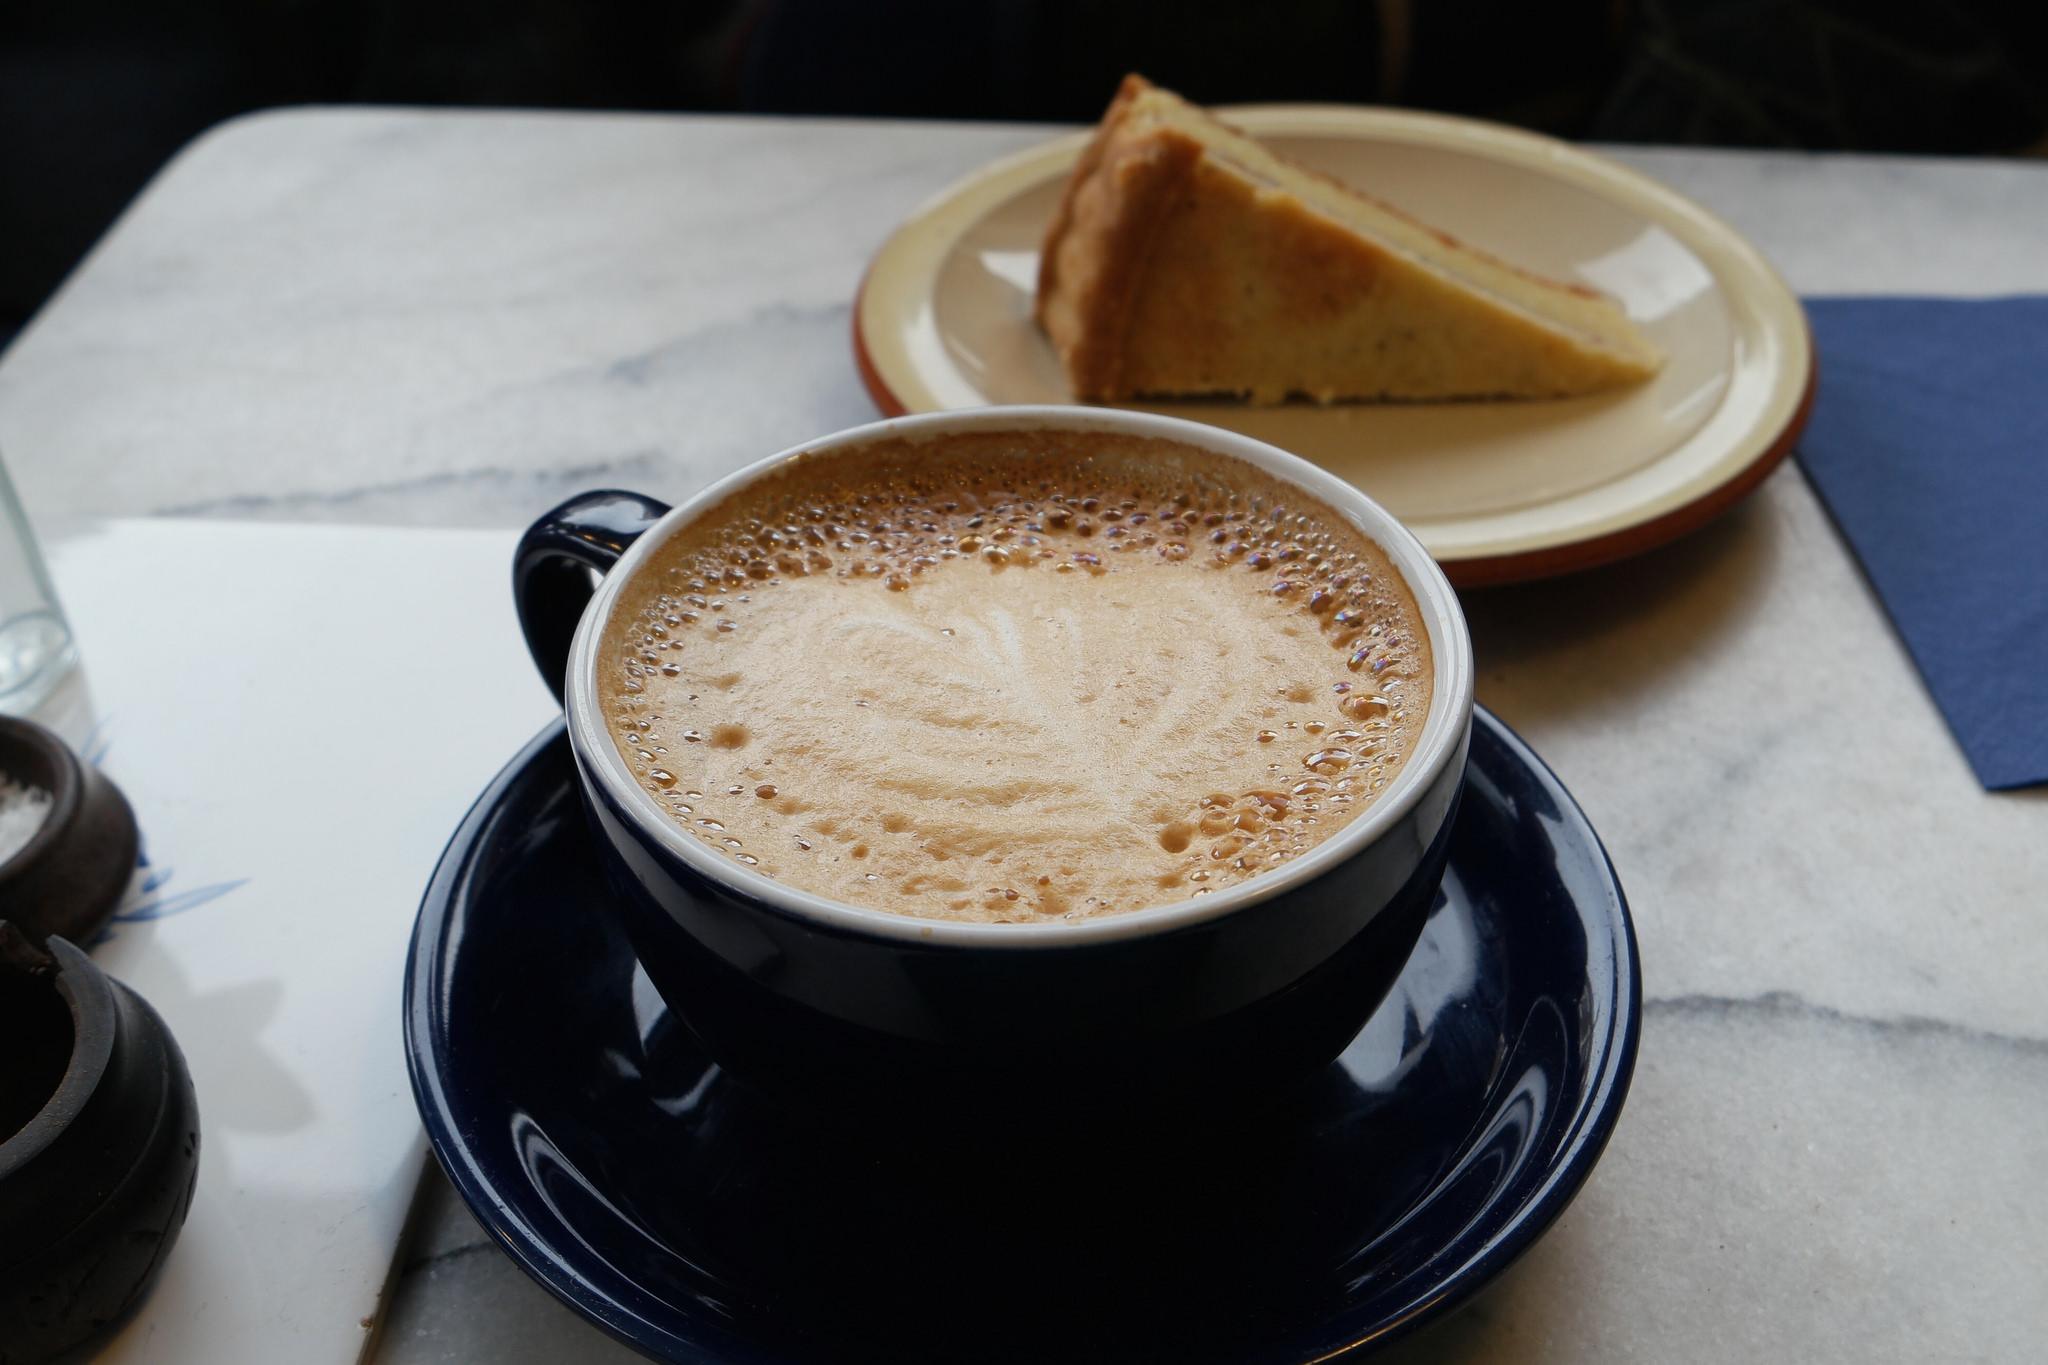 Coffee and cake | © Ashley Van Haeften/Flickr